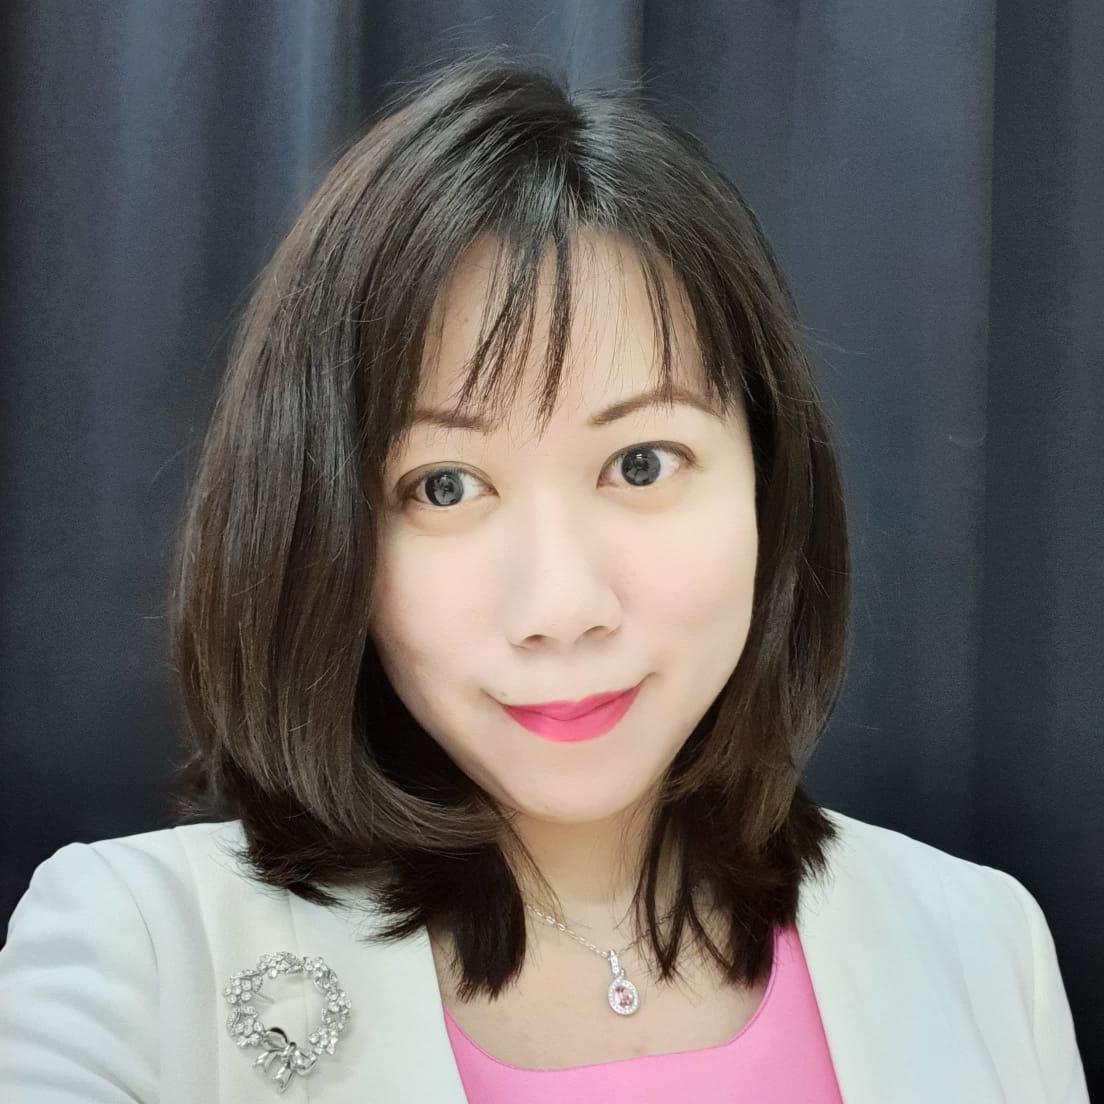 Jeannette Yeow